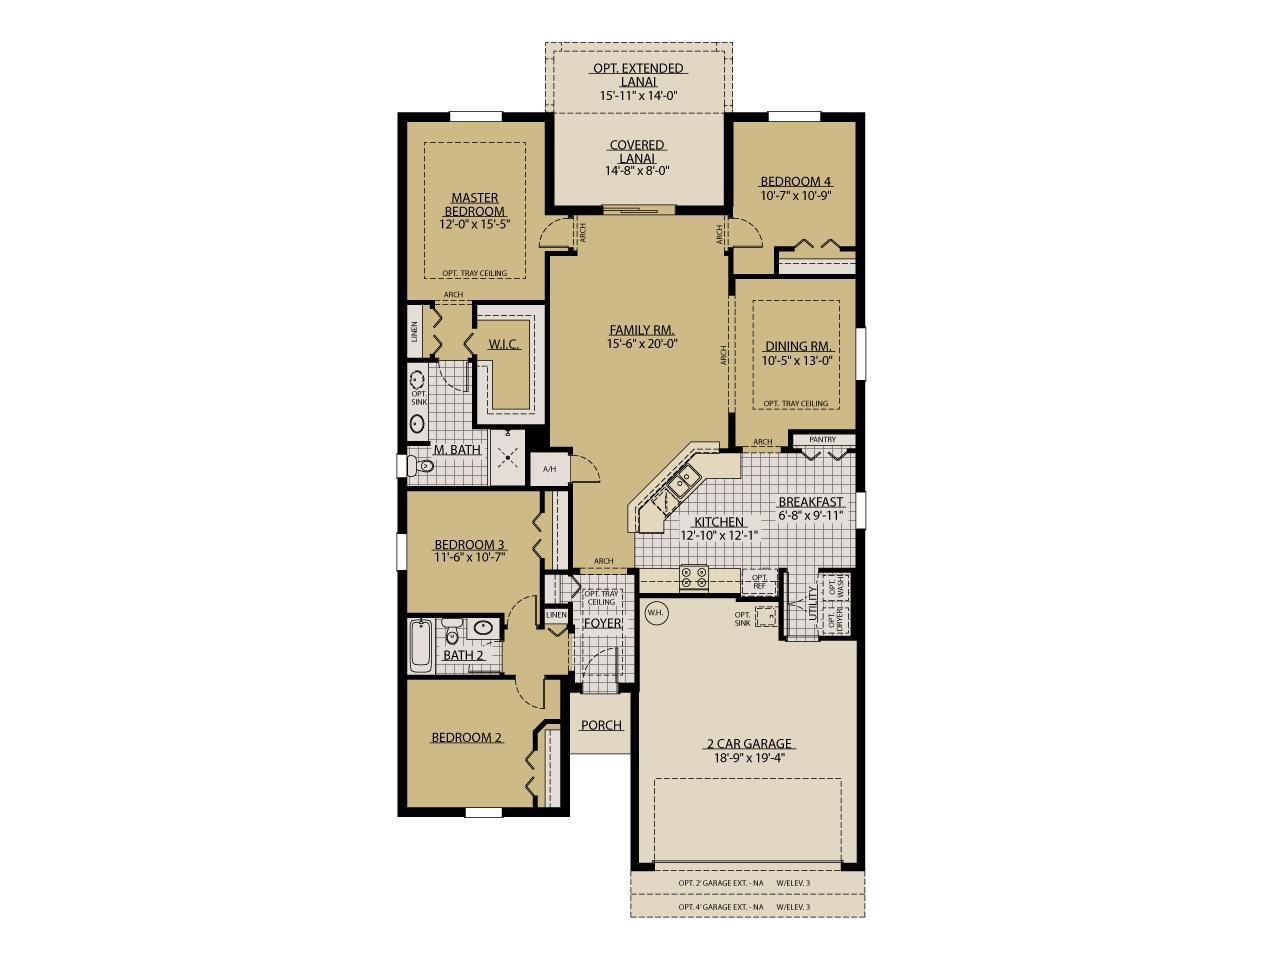 Sweetwater New Home Floor Plan – William Ryan Homes Floor Plans